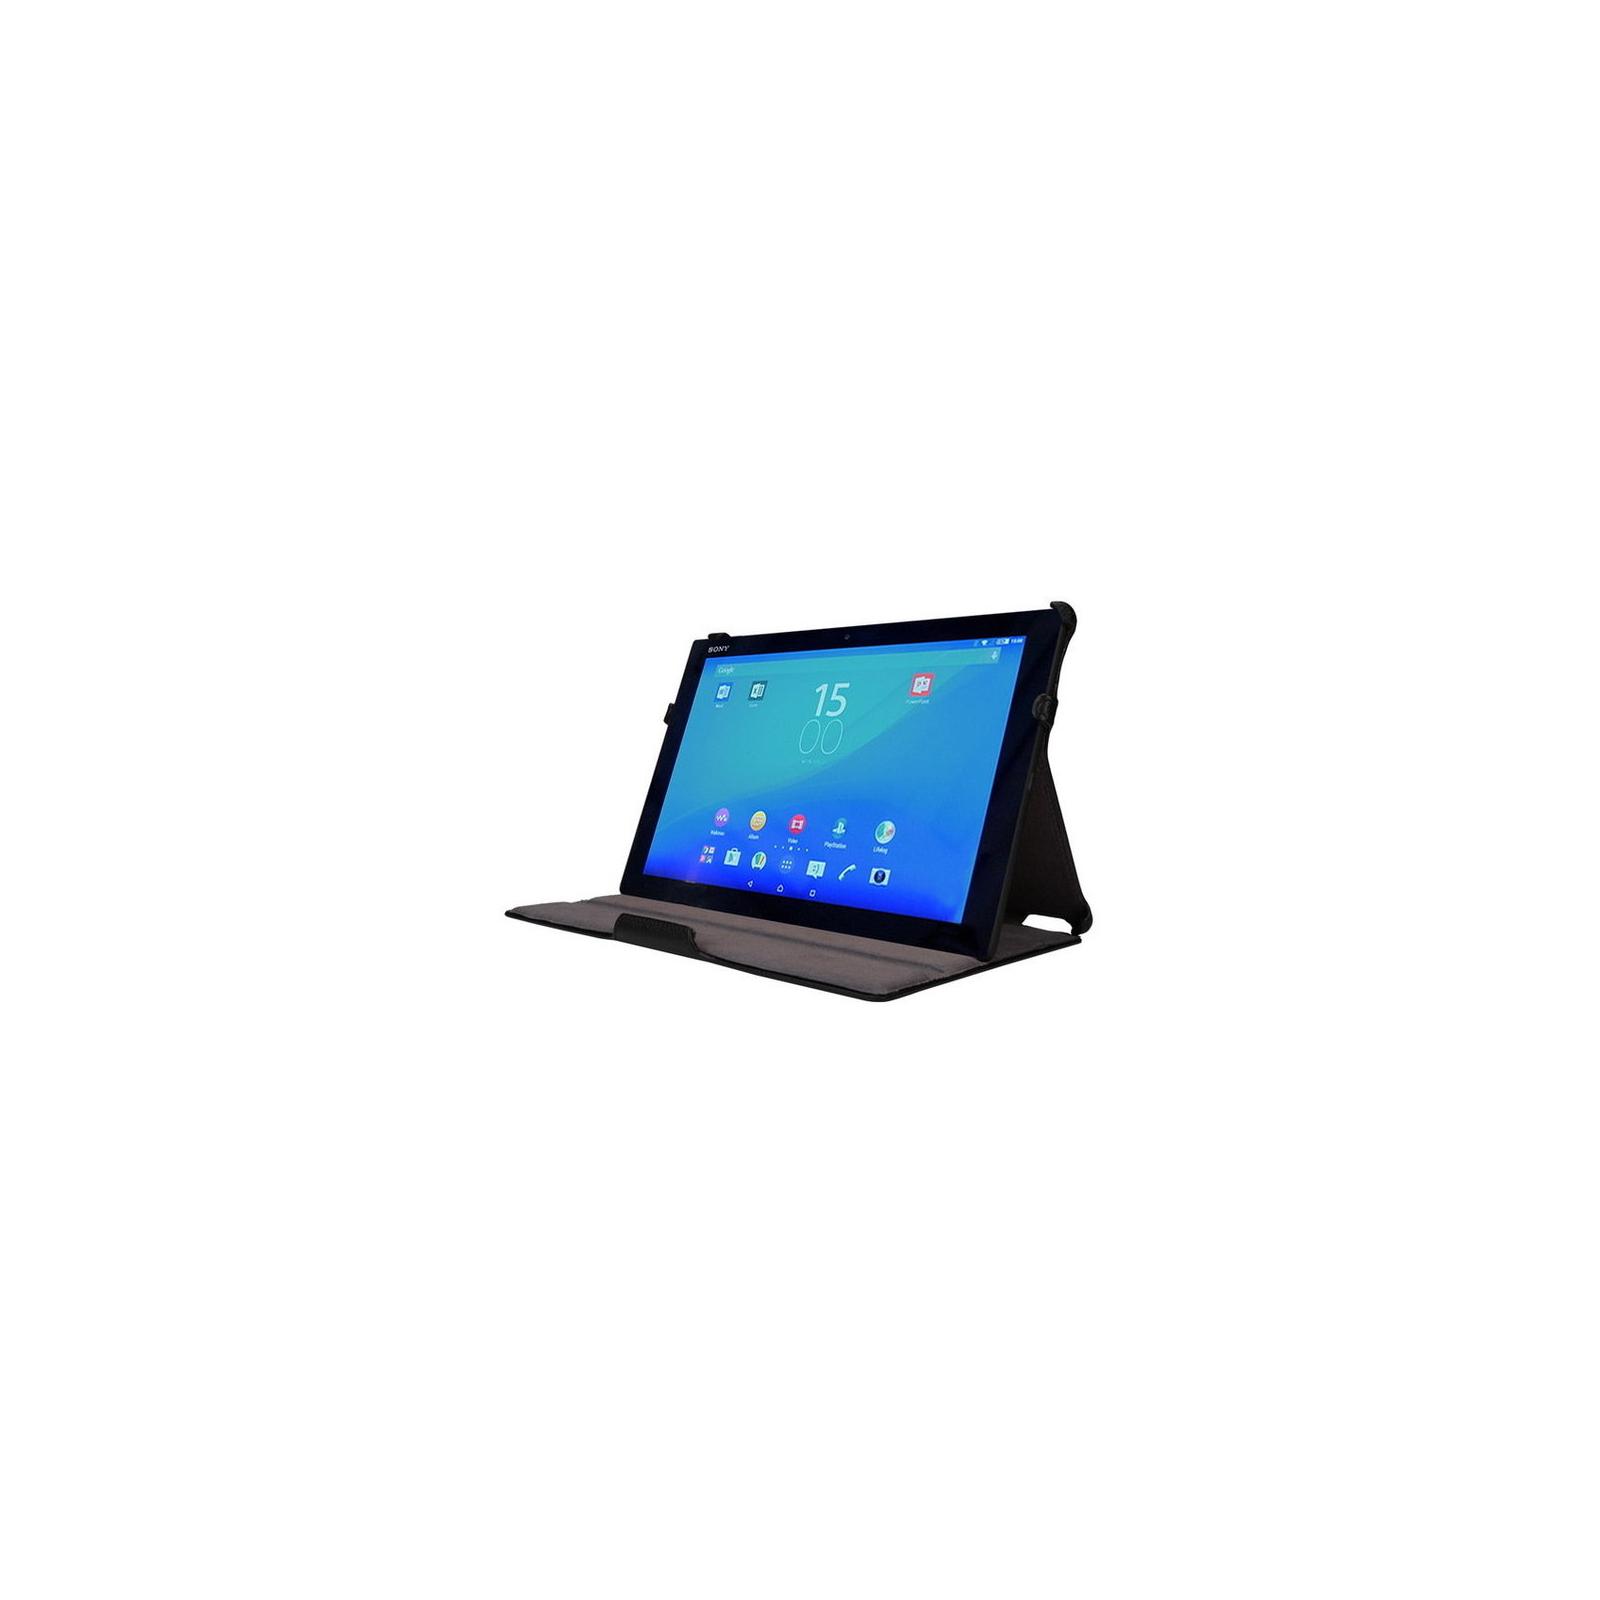 Чехол для планшета AirOn для Sony Xperia Tablet Z4 (4822356754484) изображение 5